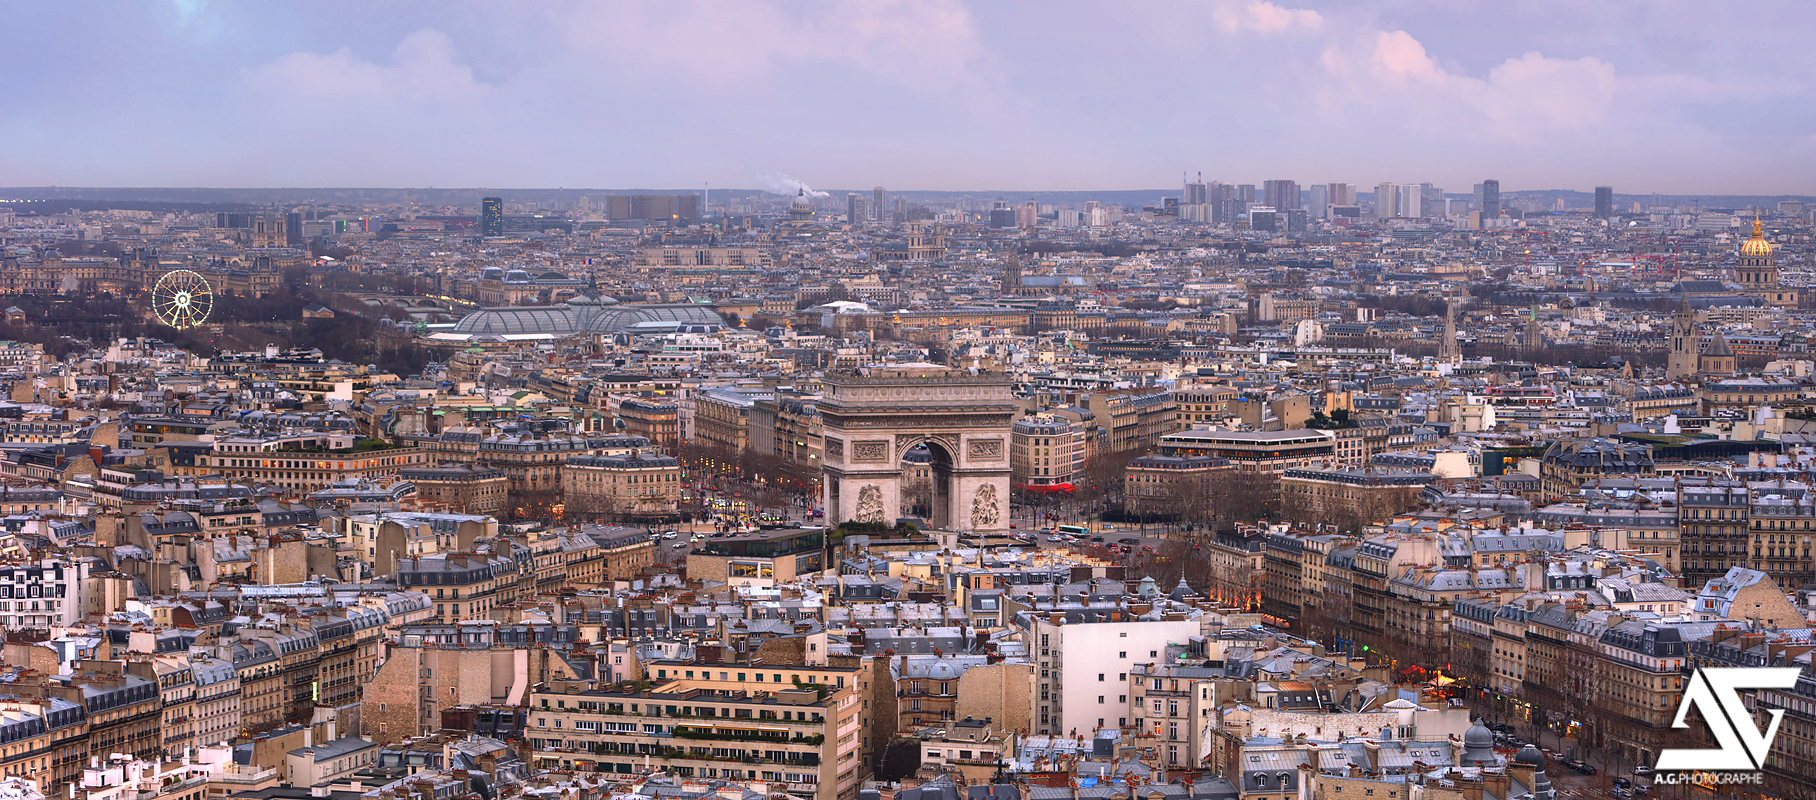 панорама_парижа_Париж_вид_сверху_высокое_качество